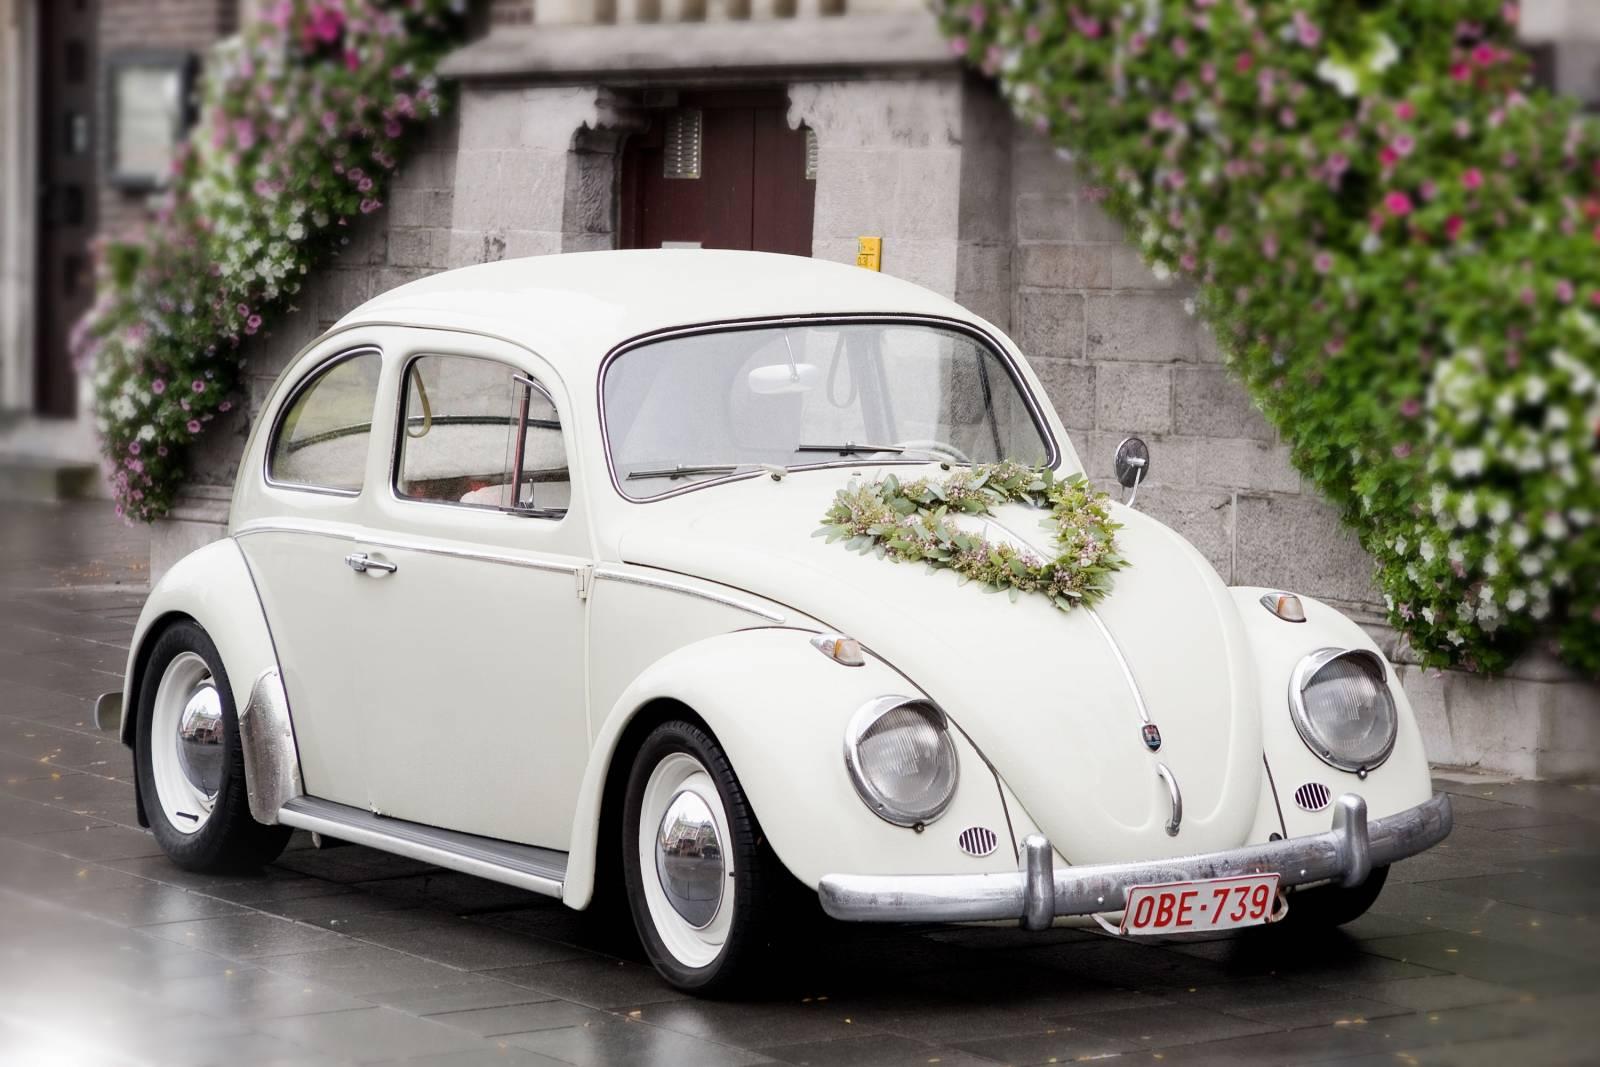 Carpe Diem Bloemen & Decoratie - House of Weddings  - 9